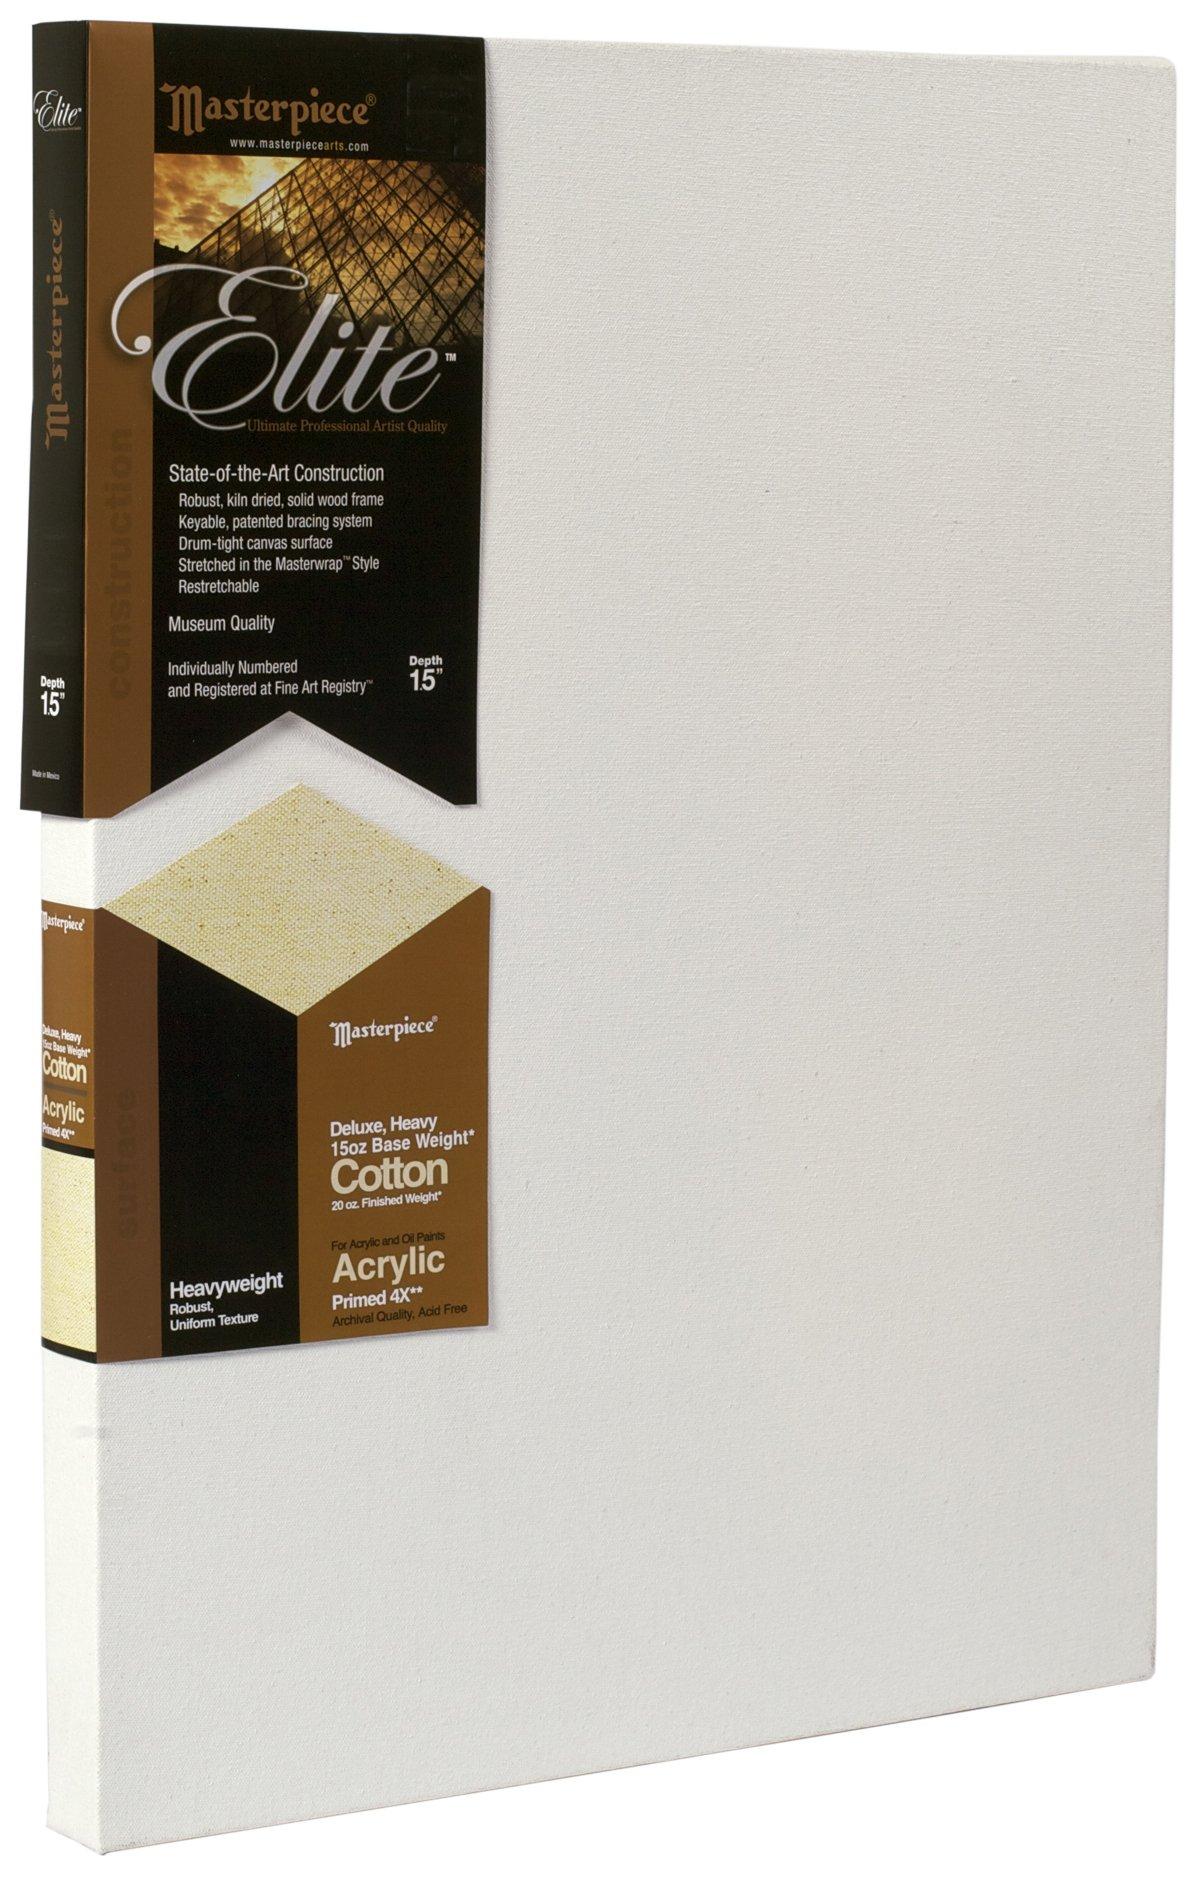 Masterpiece Artist Canvas 34551T Elite 1-1/2'' Deep, 48'' x 60'', Heavy 15-Ounce Acrylic Primed Cotton